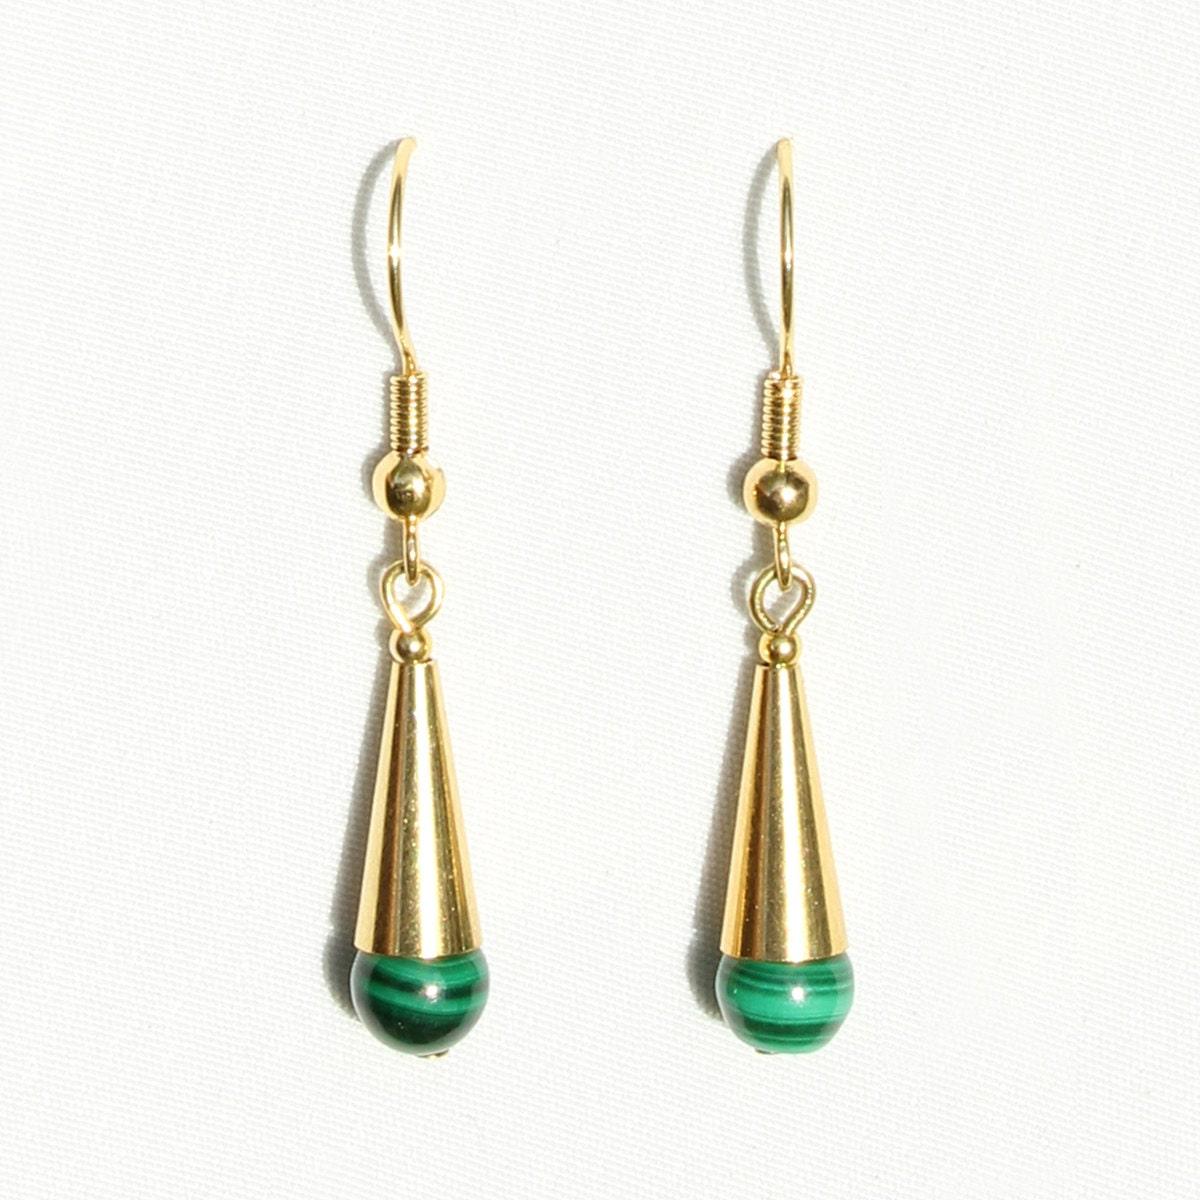 Gold drop earrings simple earrings simple gold earrings